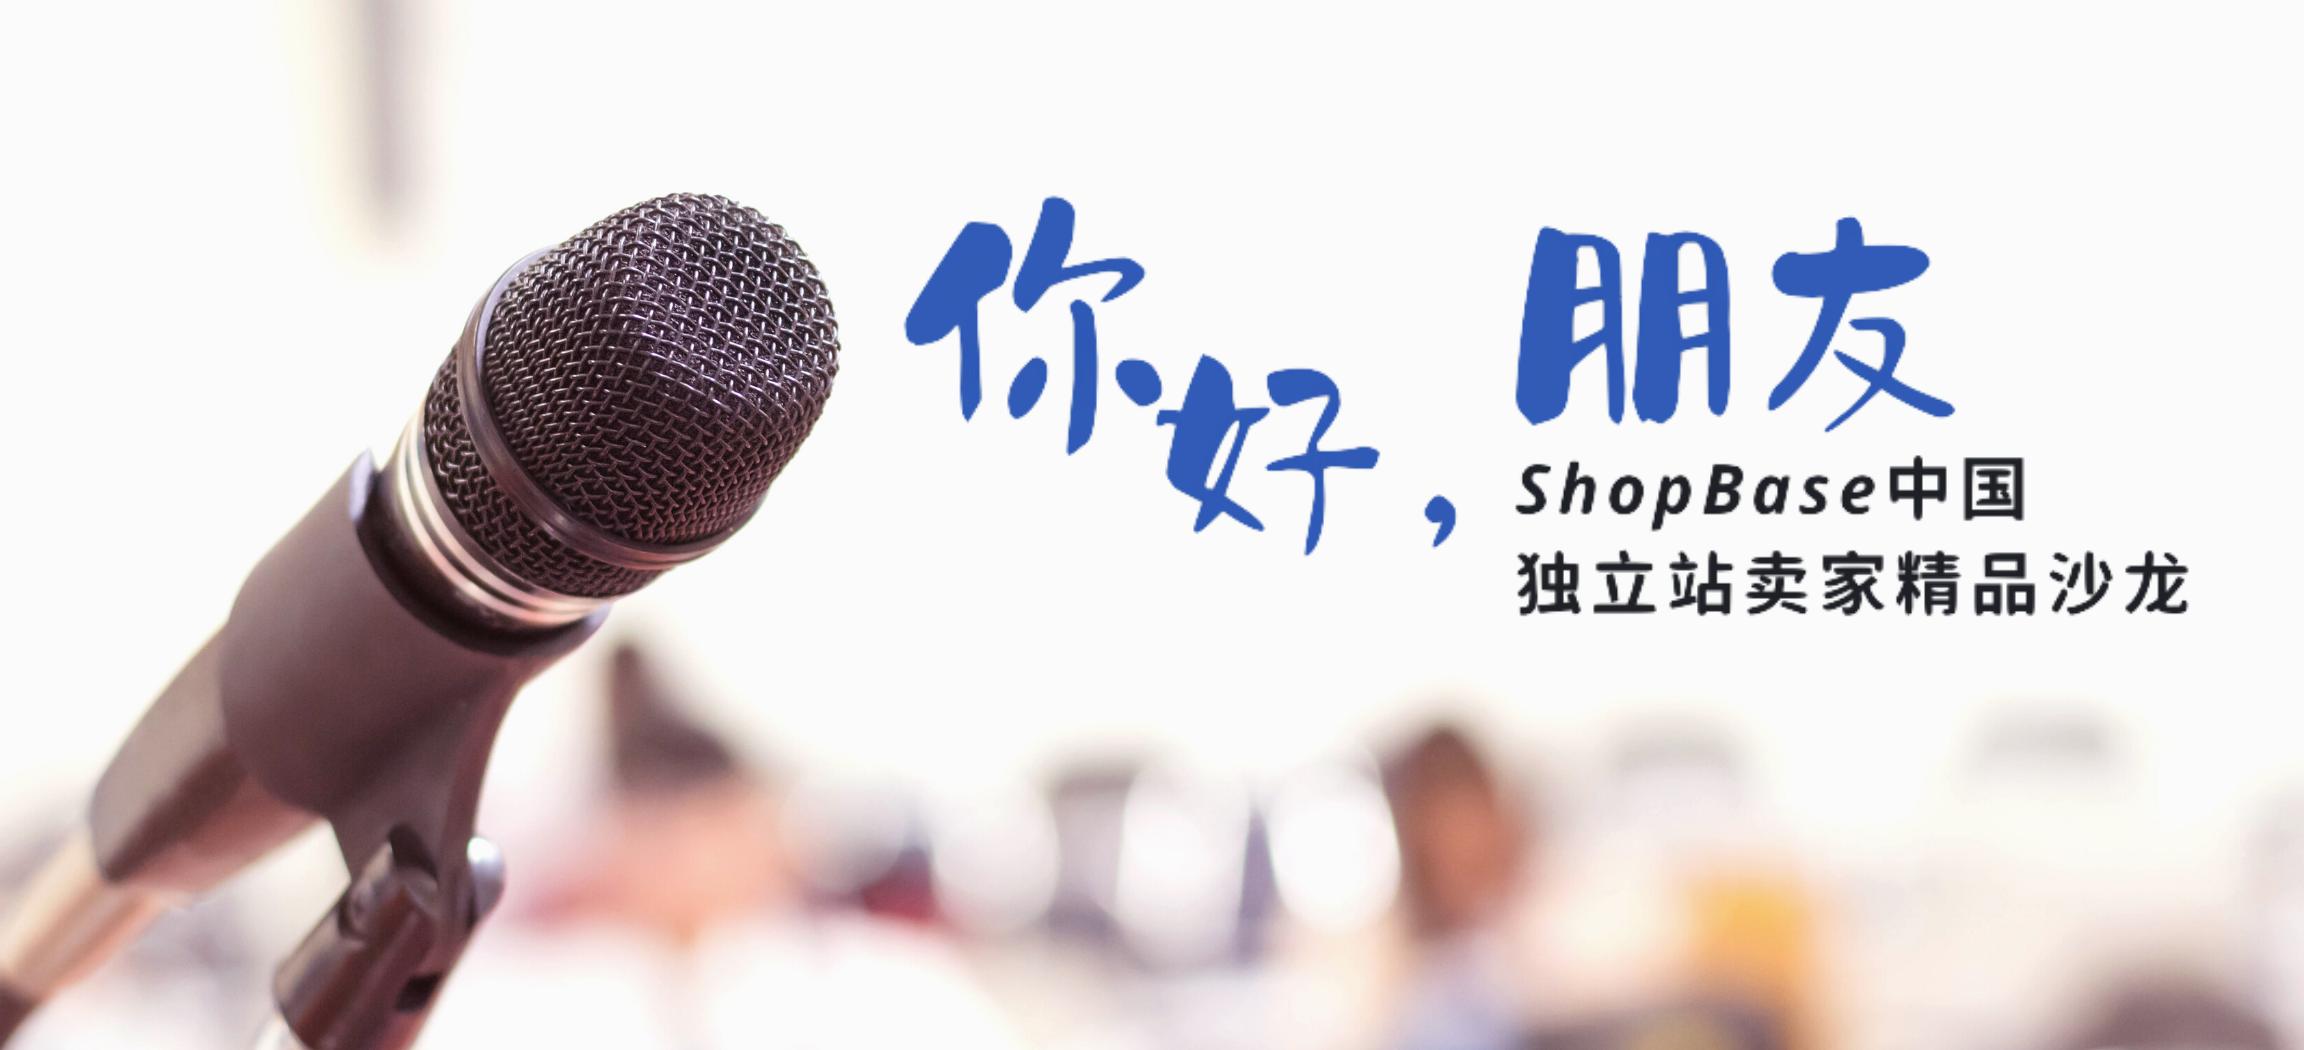 ShopBase深圳独立站线下活动